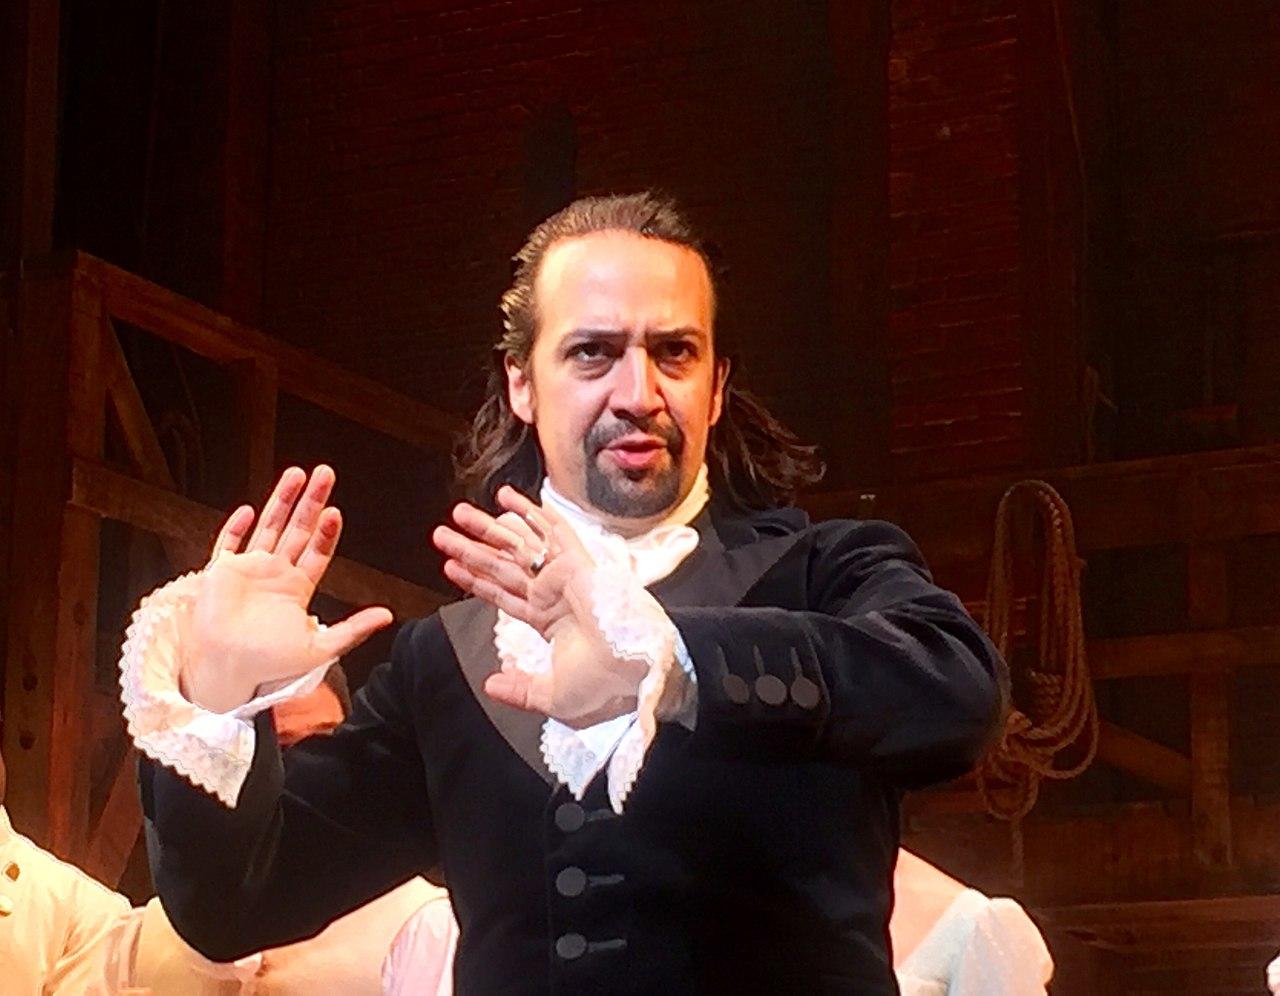 """Lin Manuel Miranda as Hamilton""   by  Steve Jurvetson  is licensed under  CC BY 2.0"